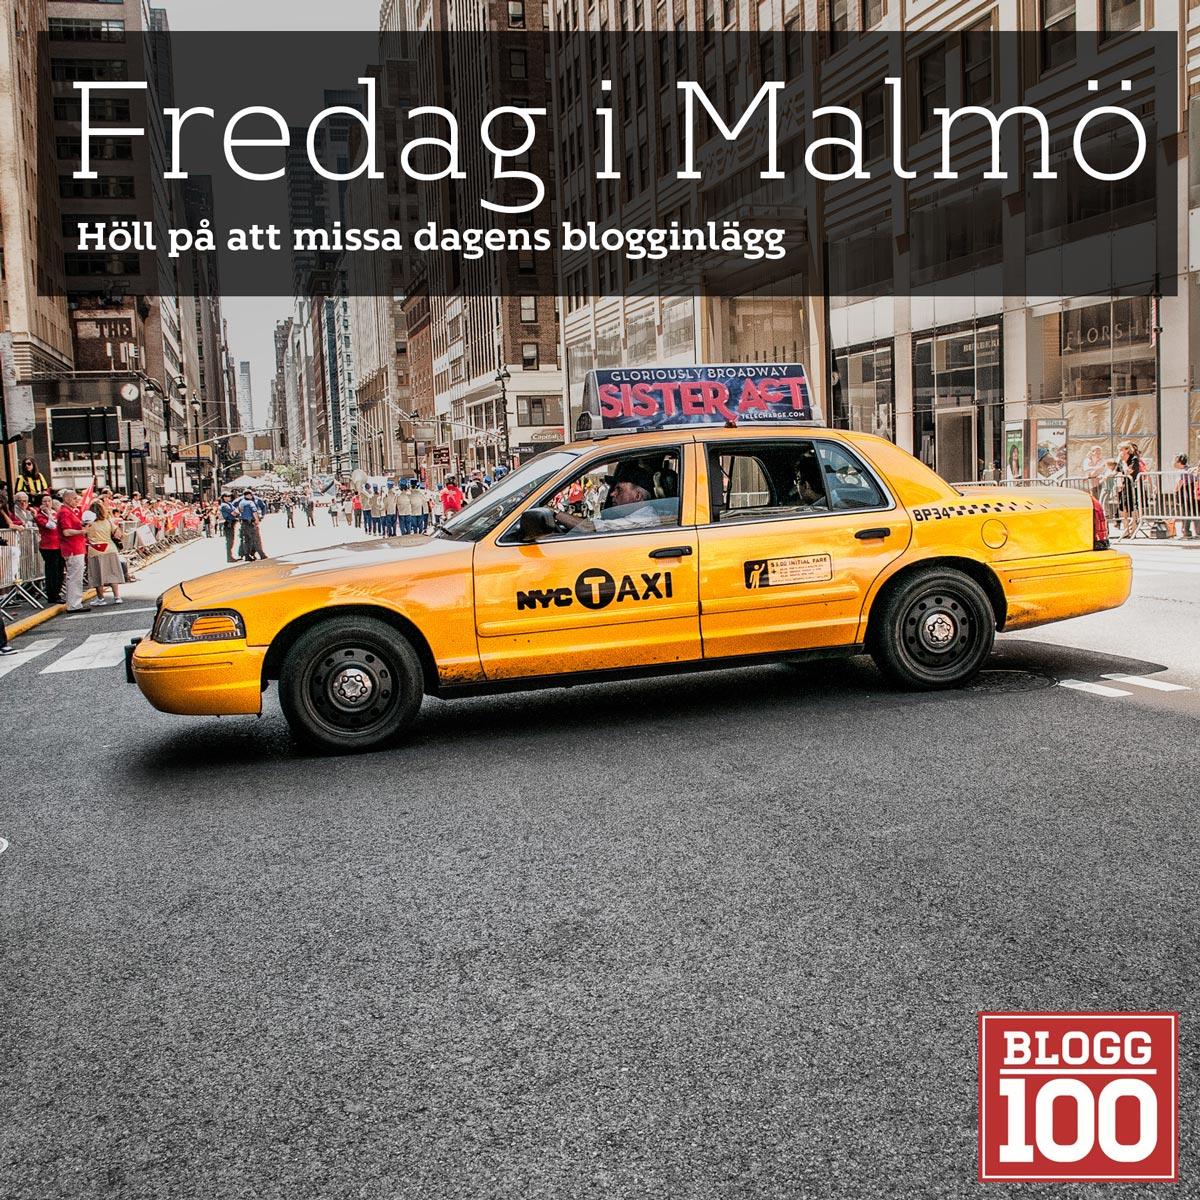 Fredag i Malmö #blogg100 #fb